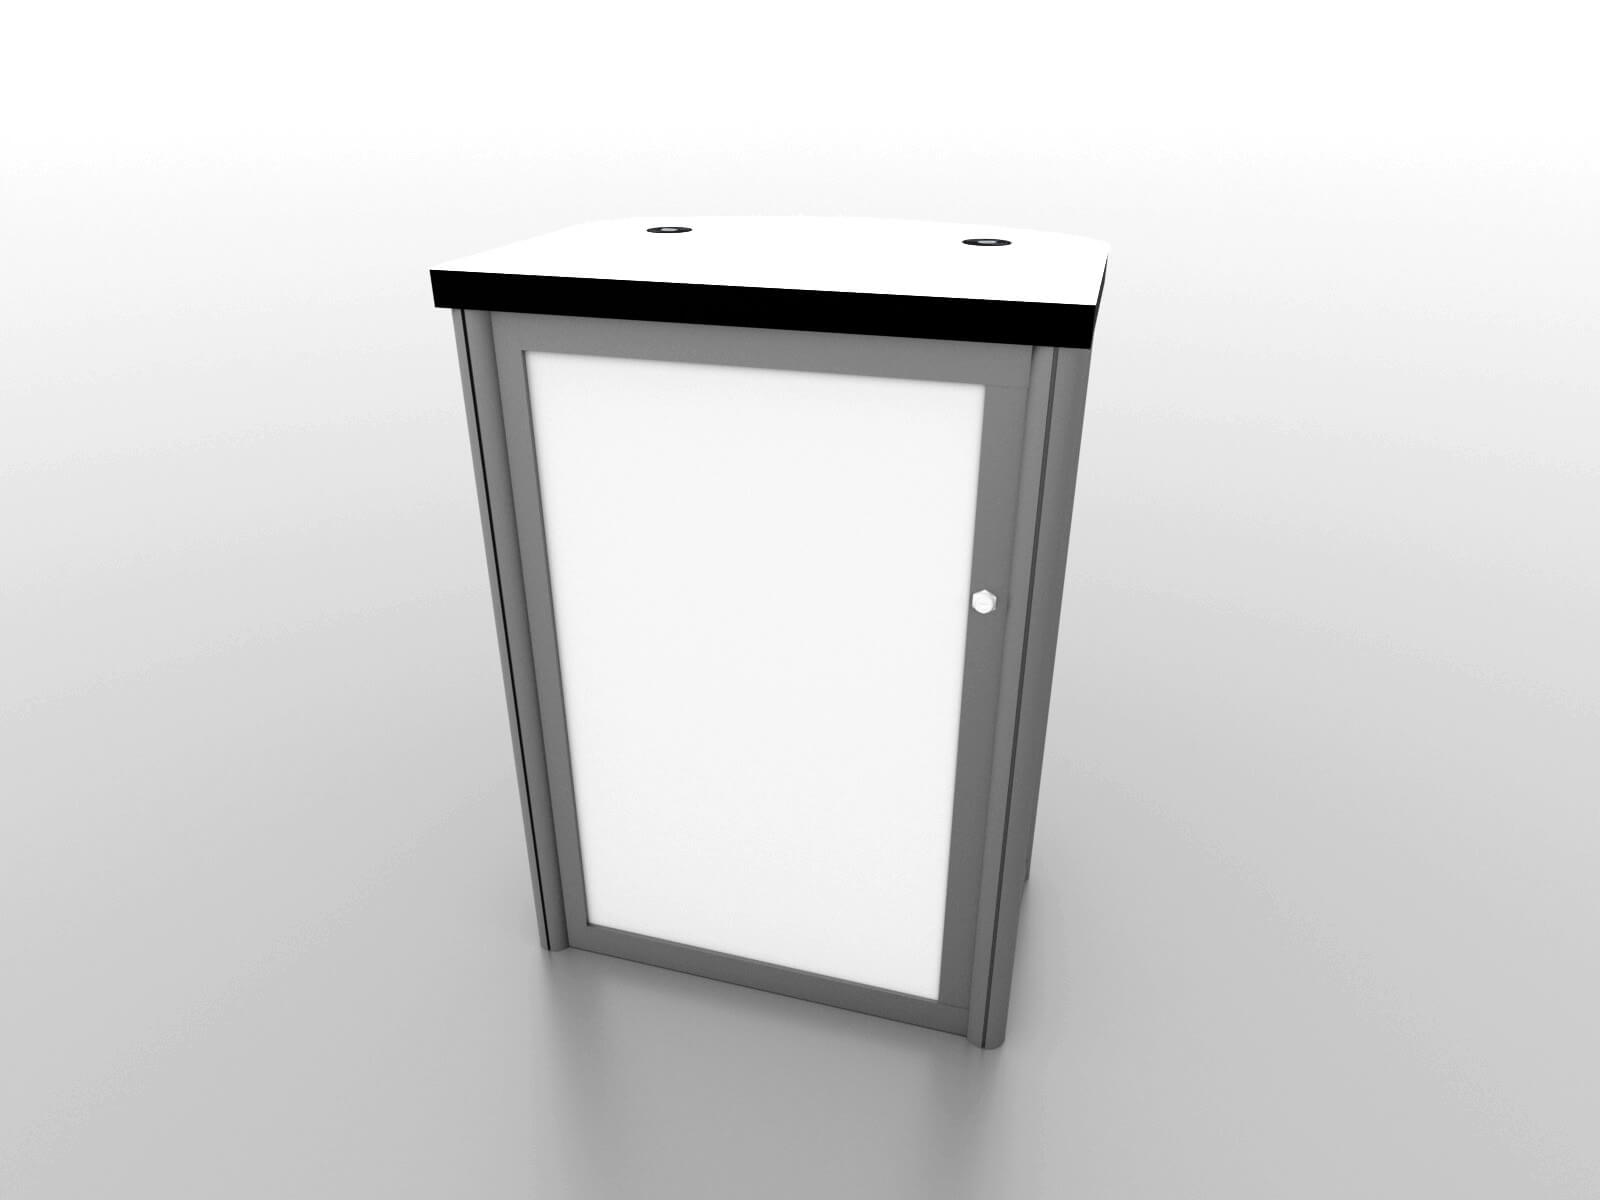 MOD 1267c Modular Pedestal with Locking Storage and Charging Ports image 3